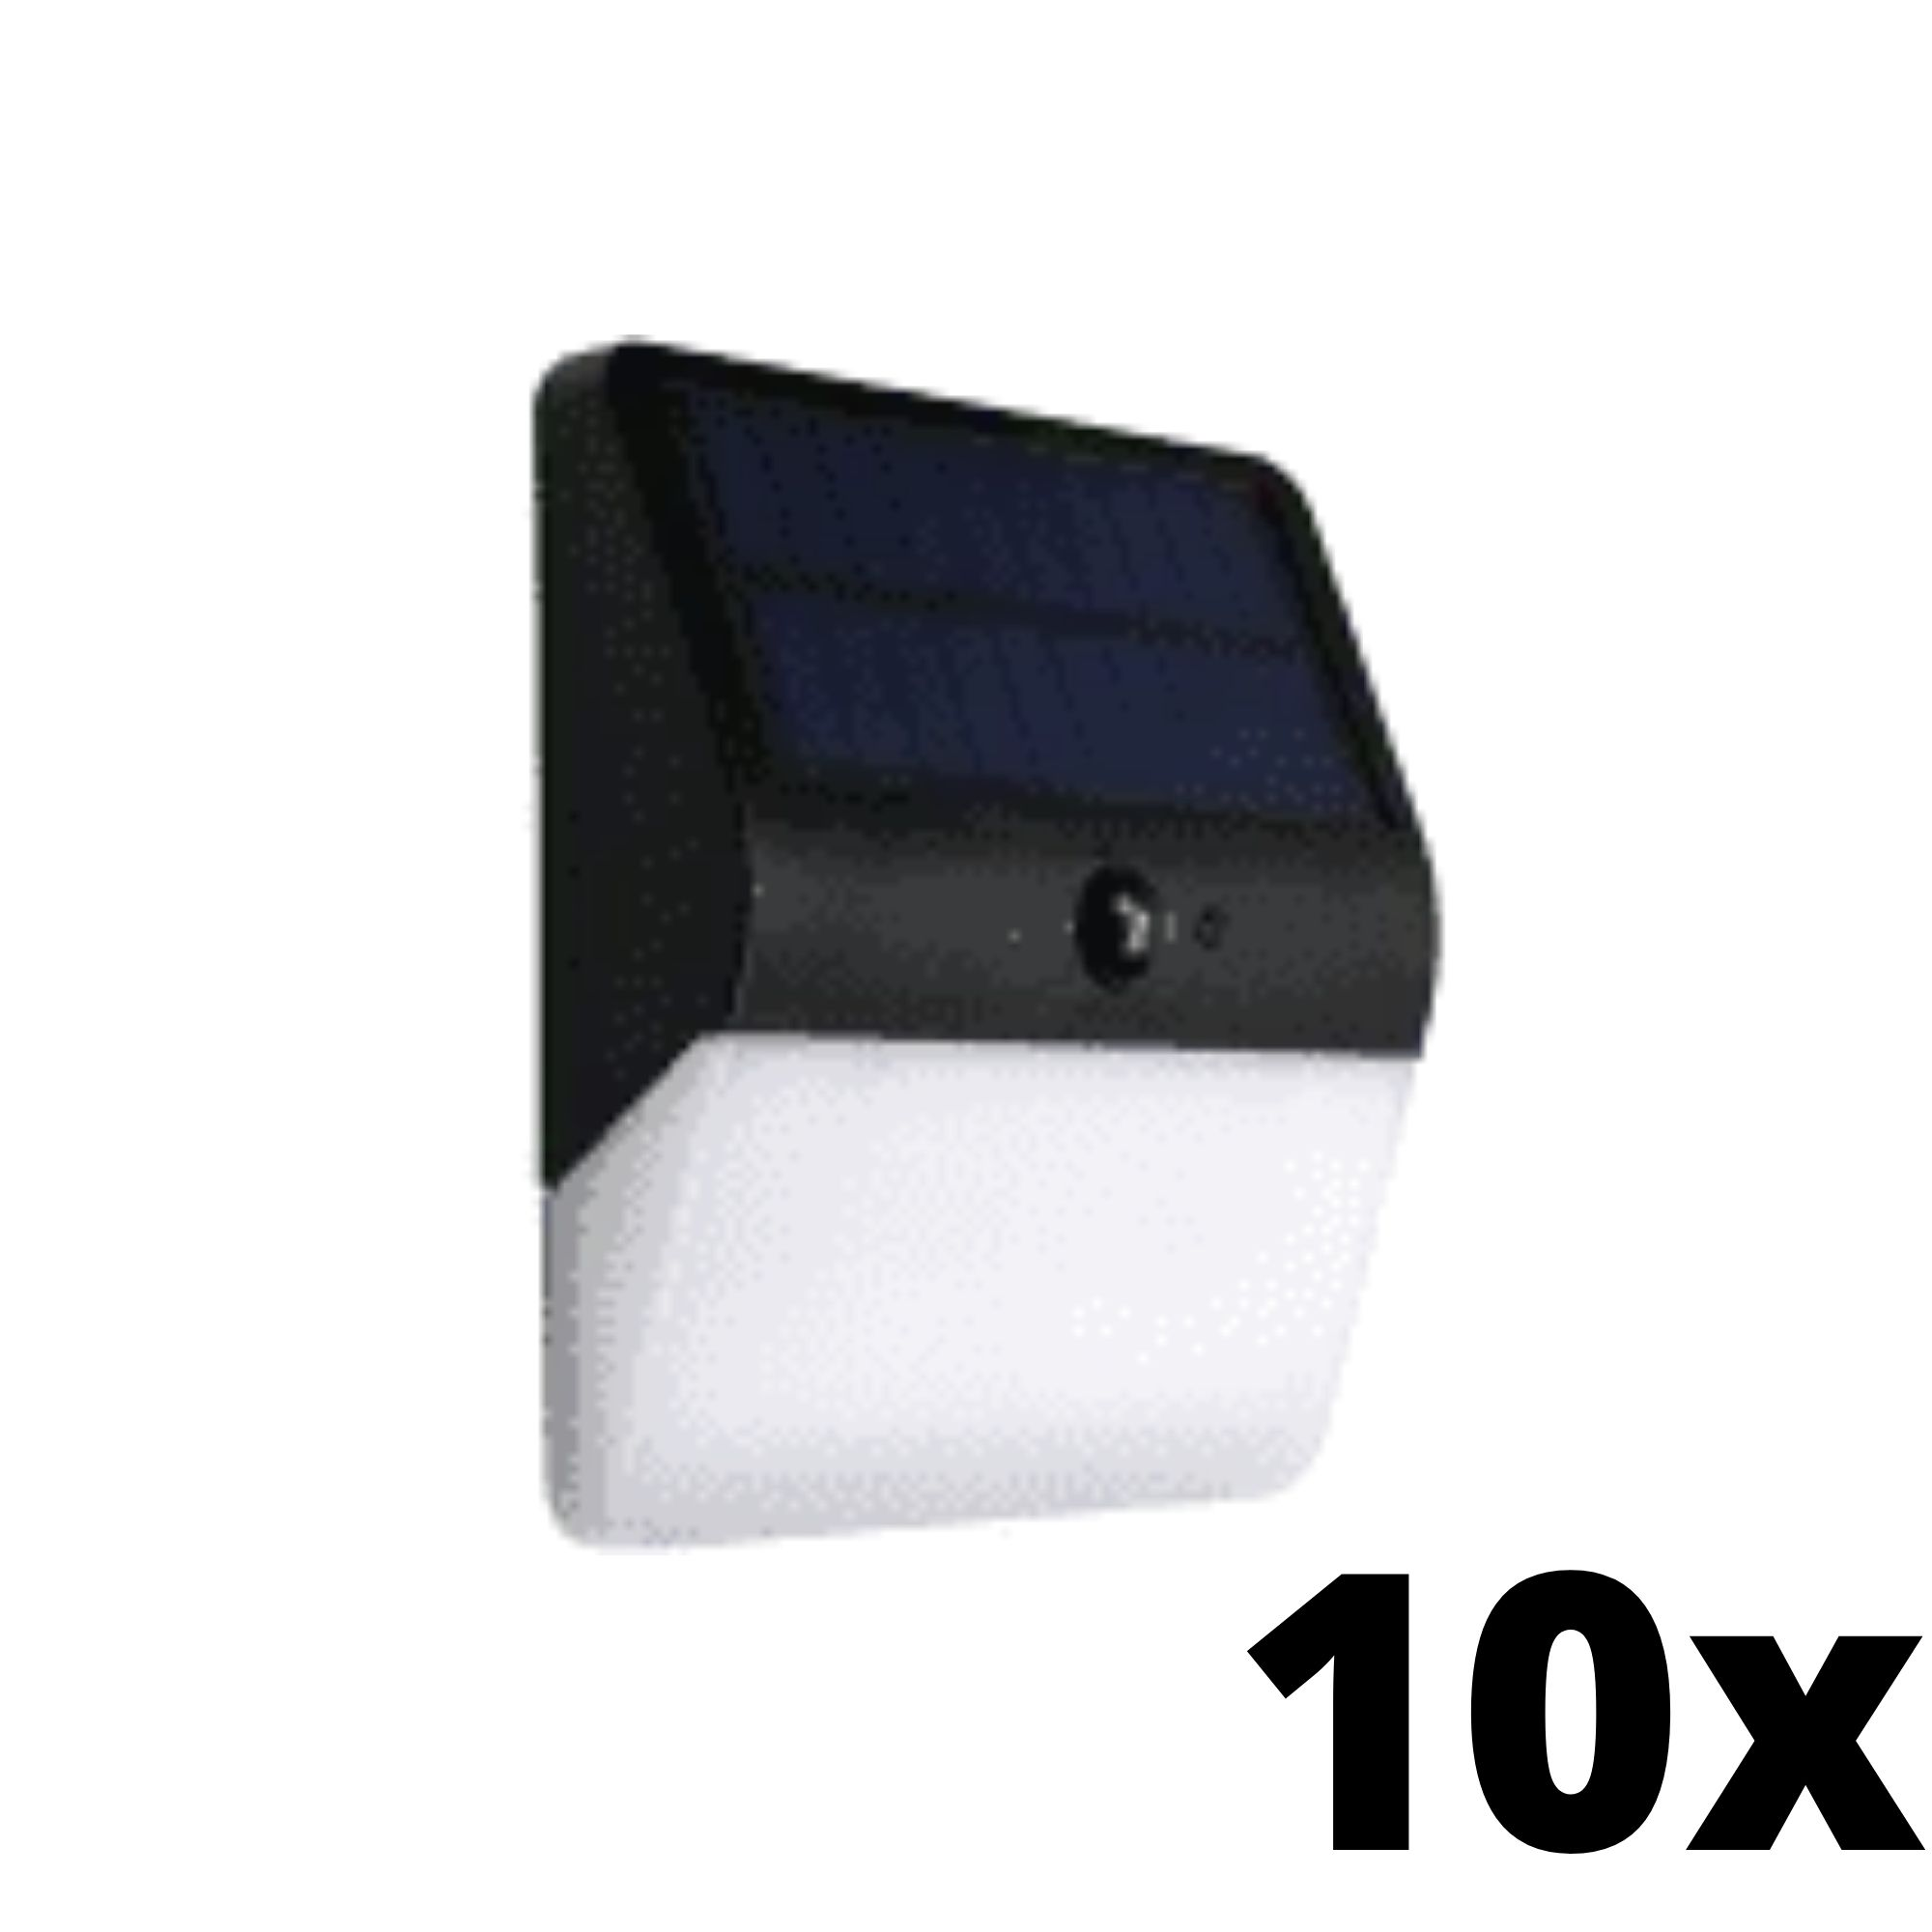 Kit 10 und Ecoforce Arandela Solar Com Sensor Presenca 400 Lumens 6000k